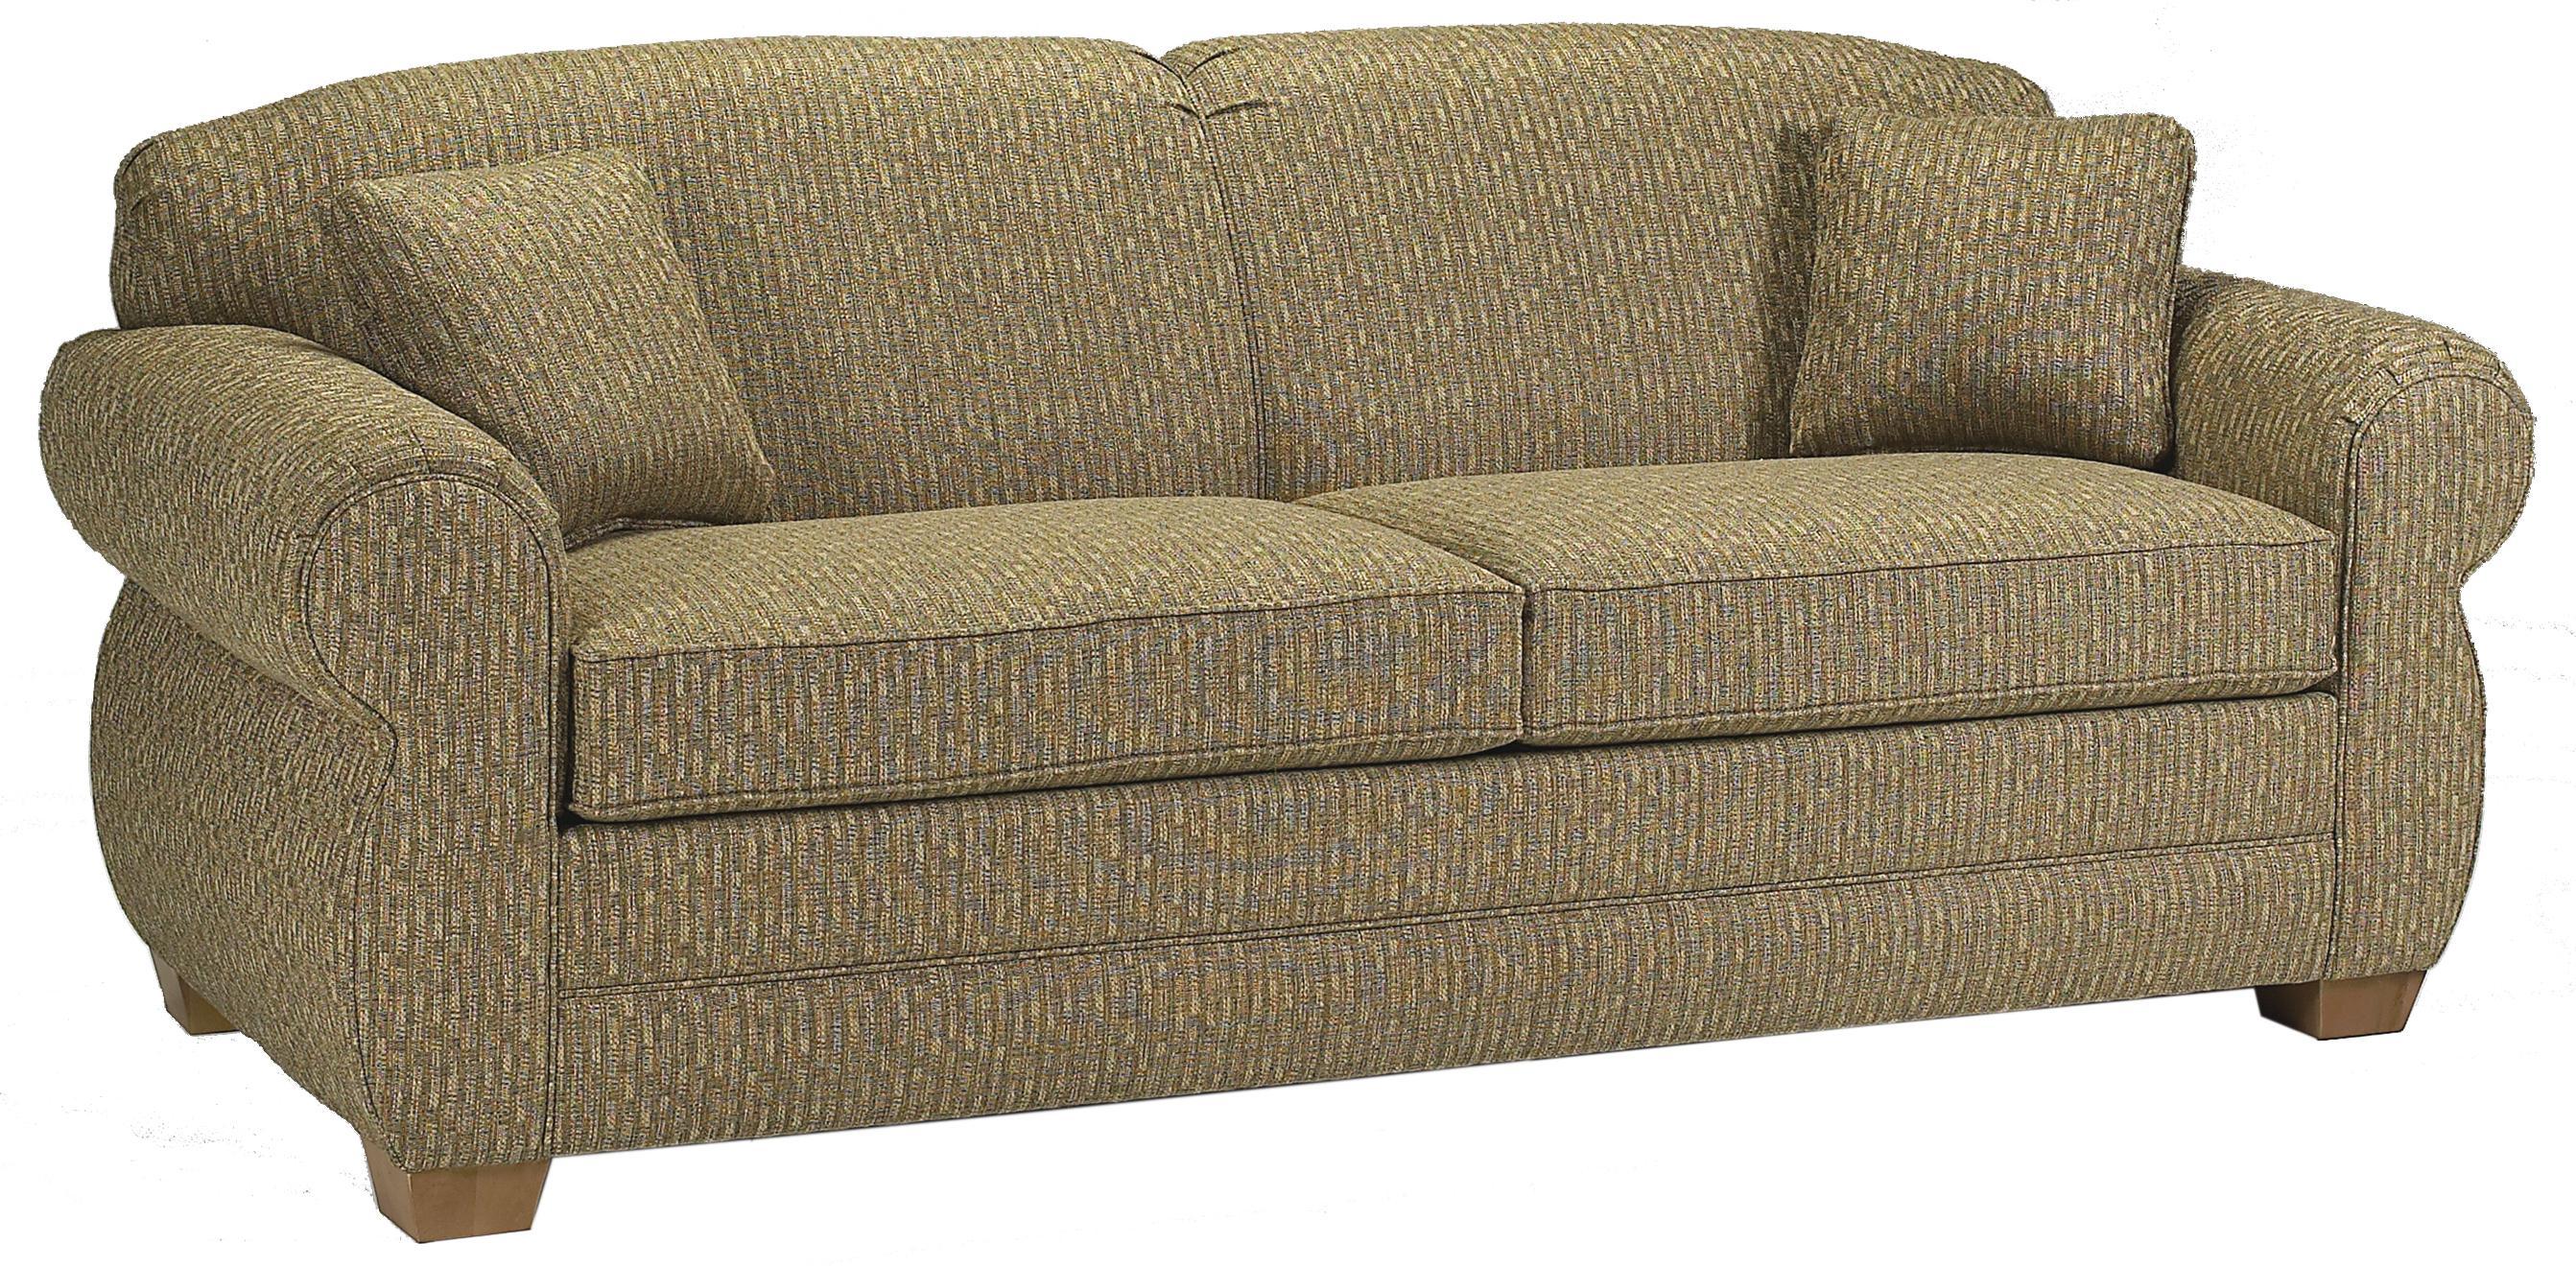 2700 Sofa by Lancer at H.L. Stephens